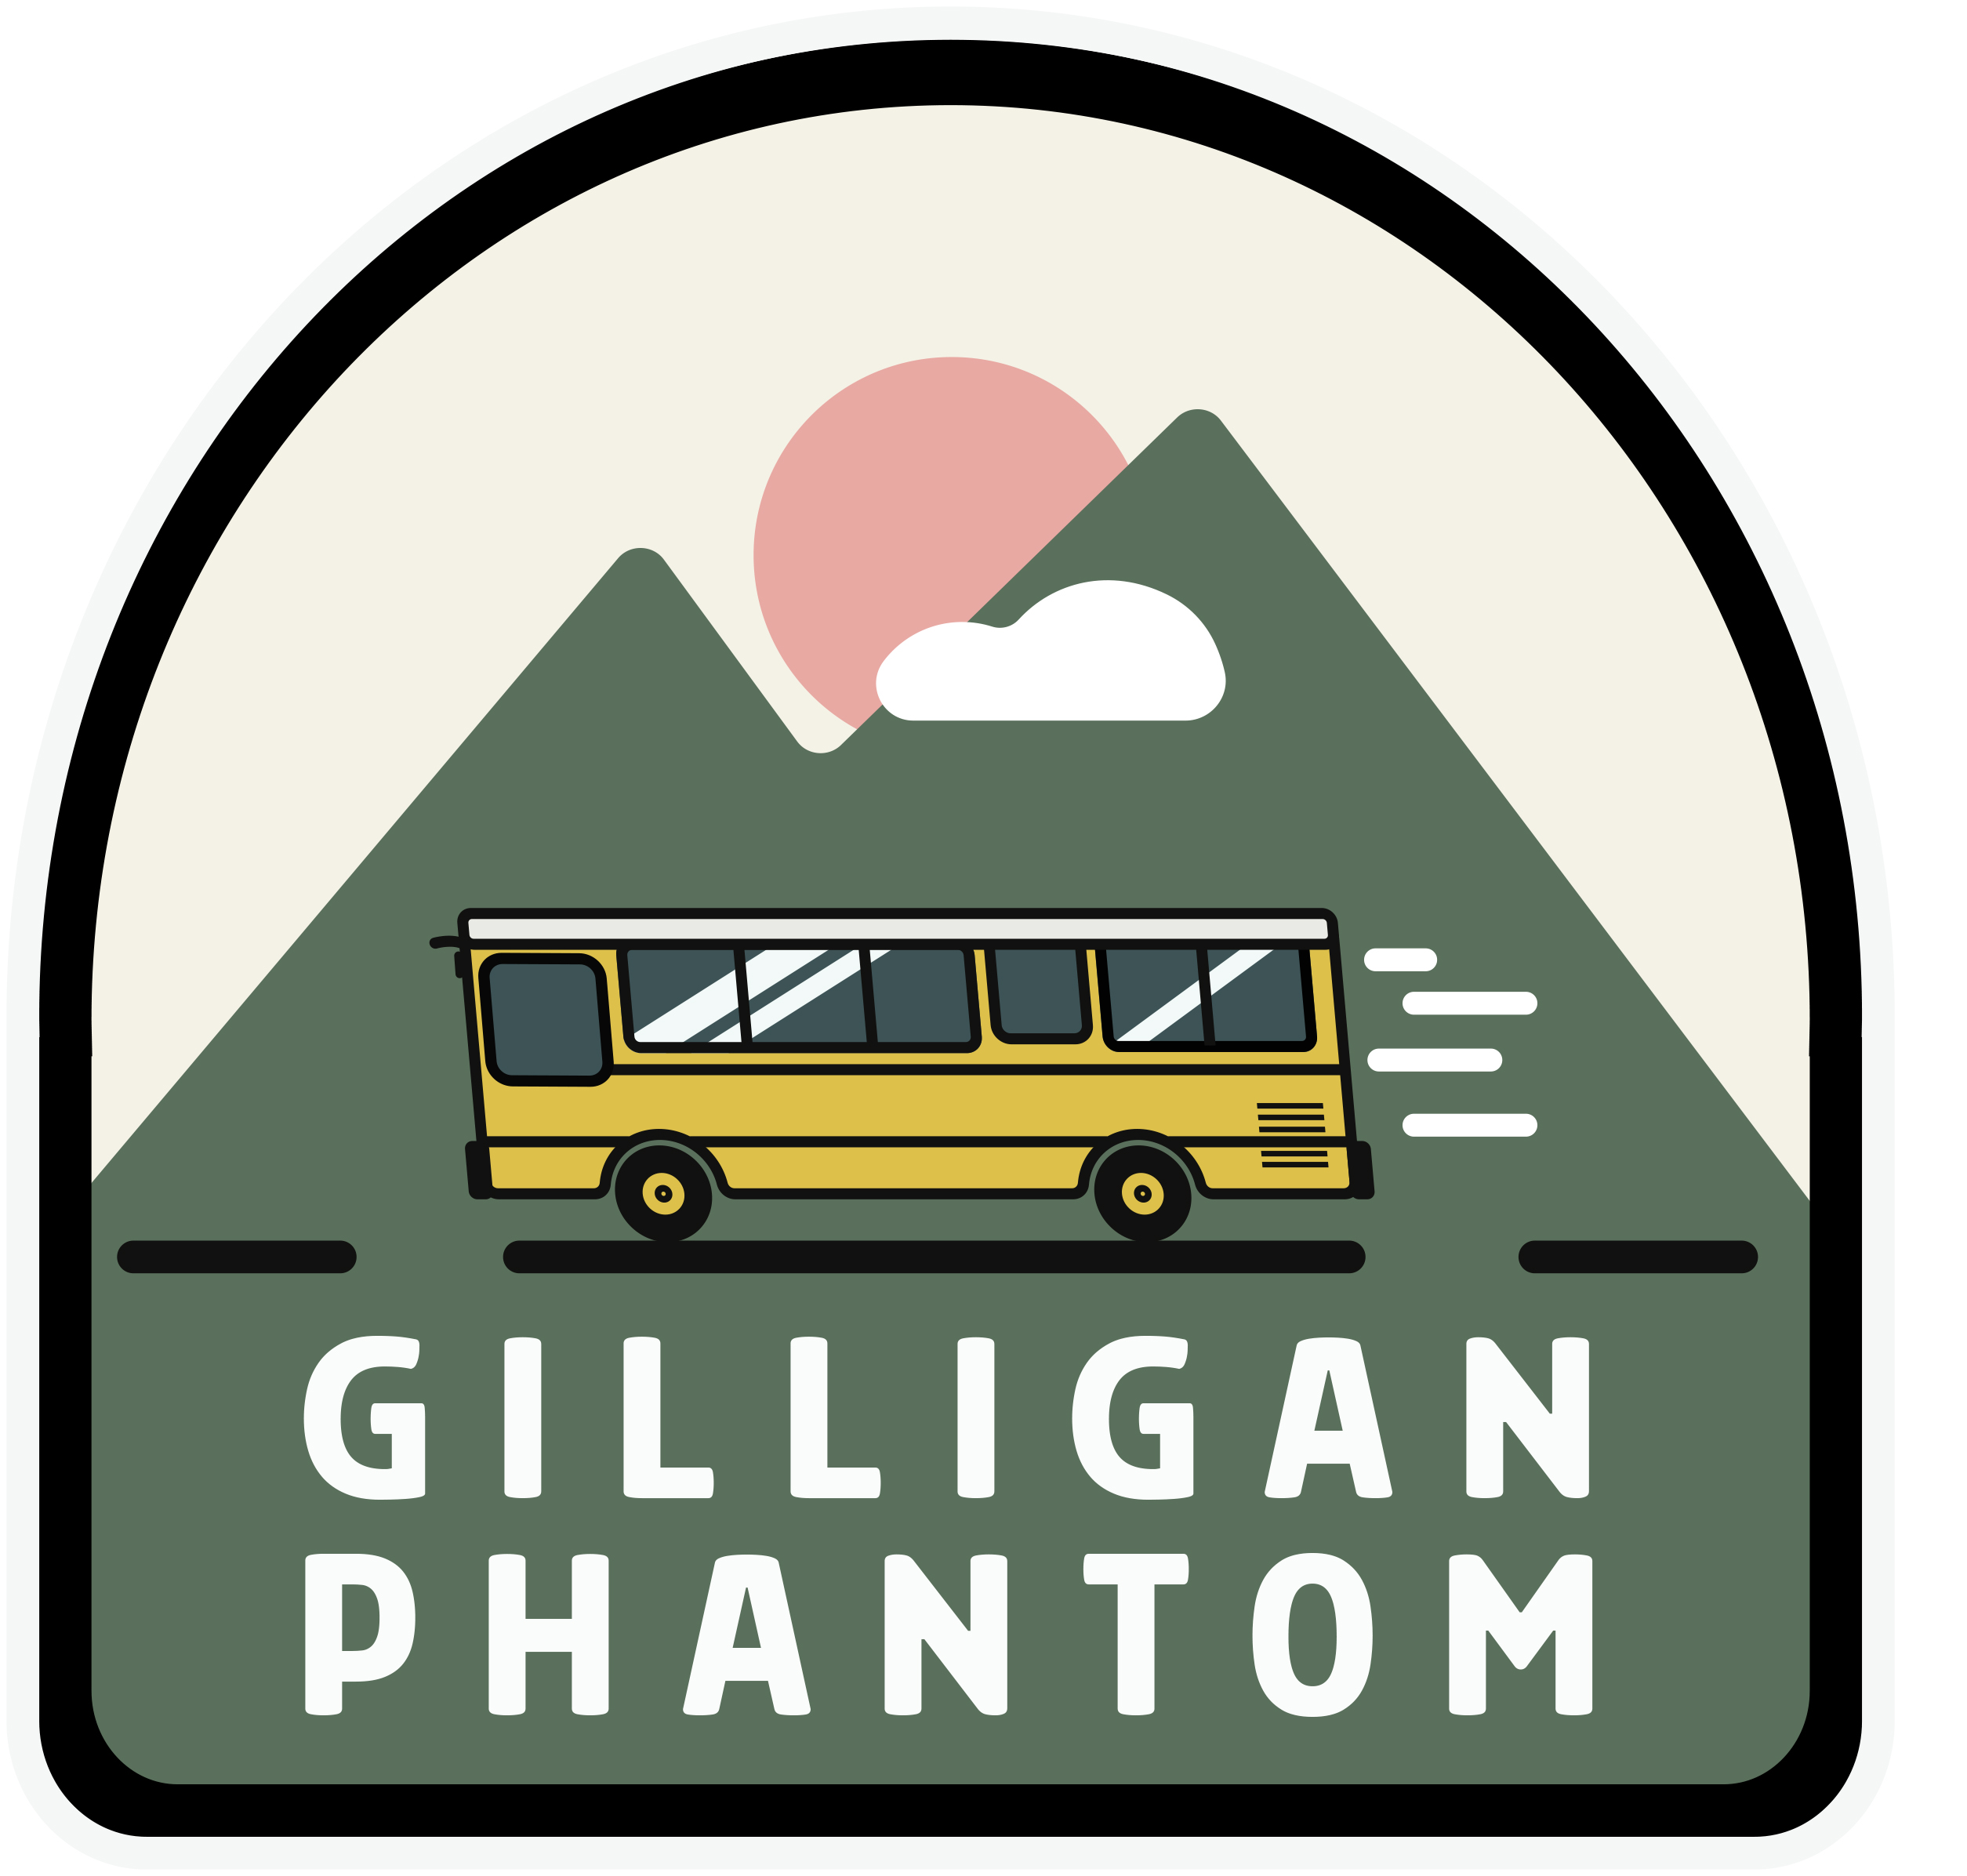 Gilligan Phantom